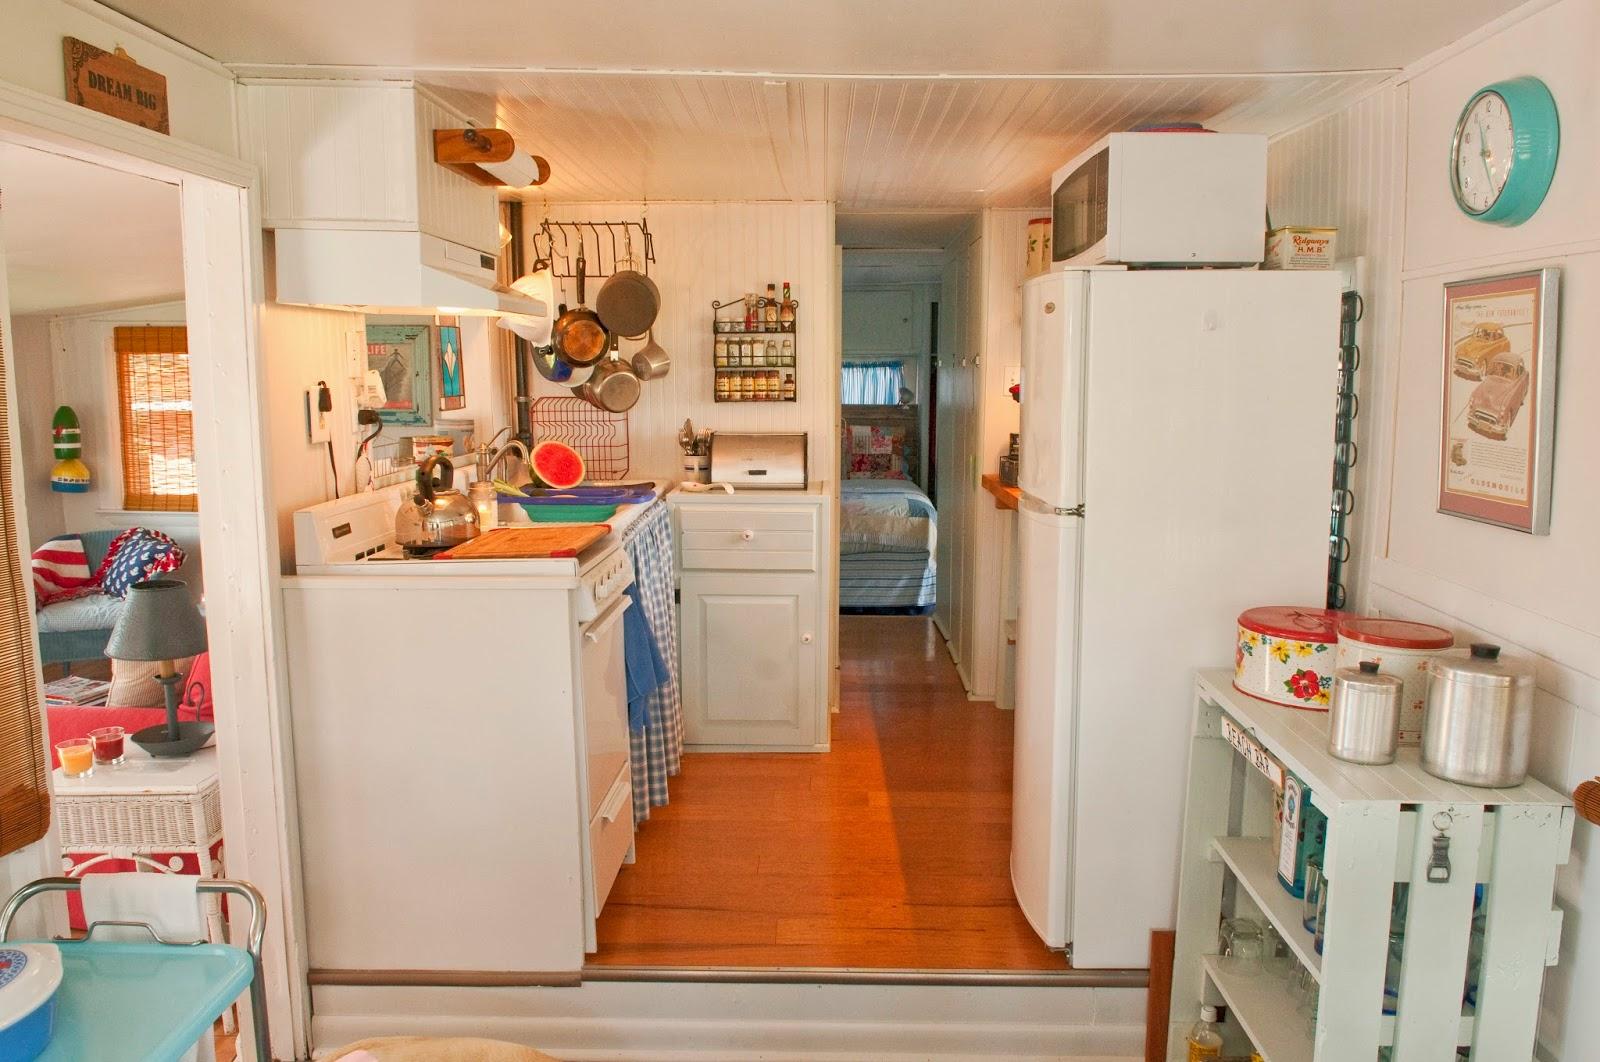 Kitchen In Vintage Mobile Home